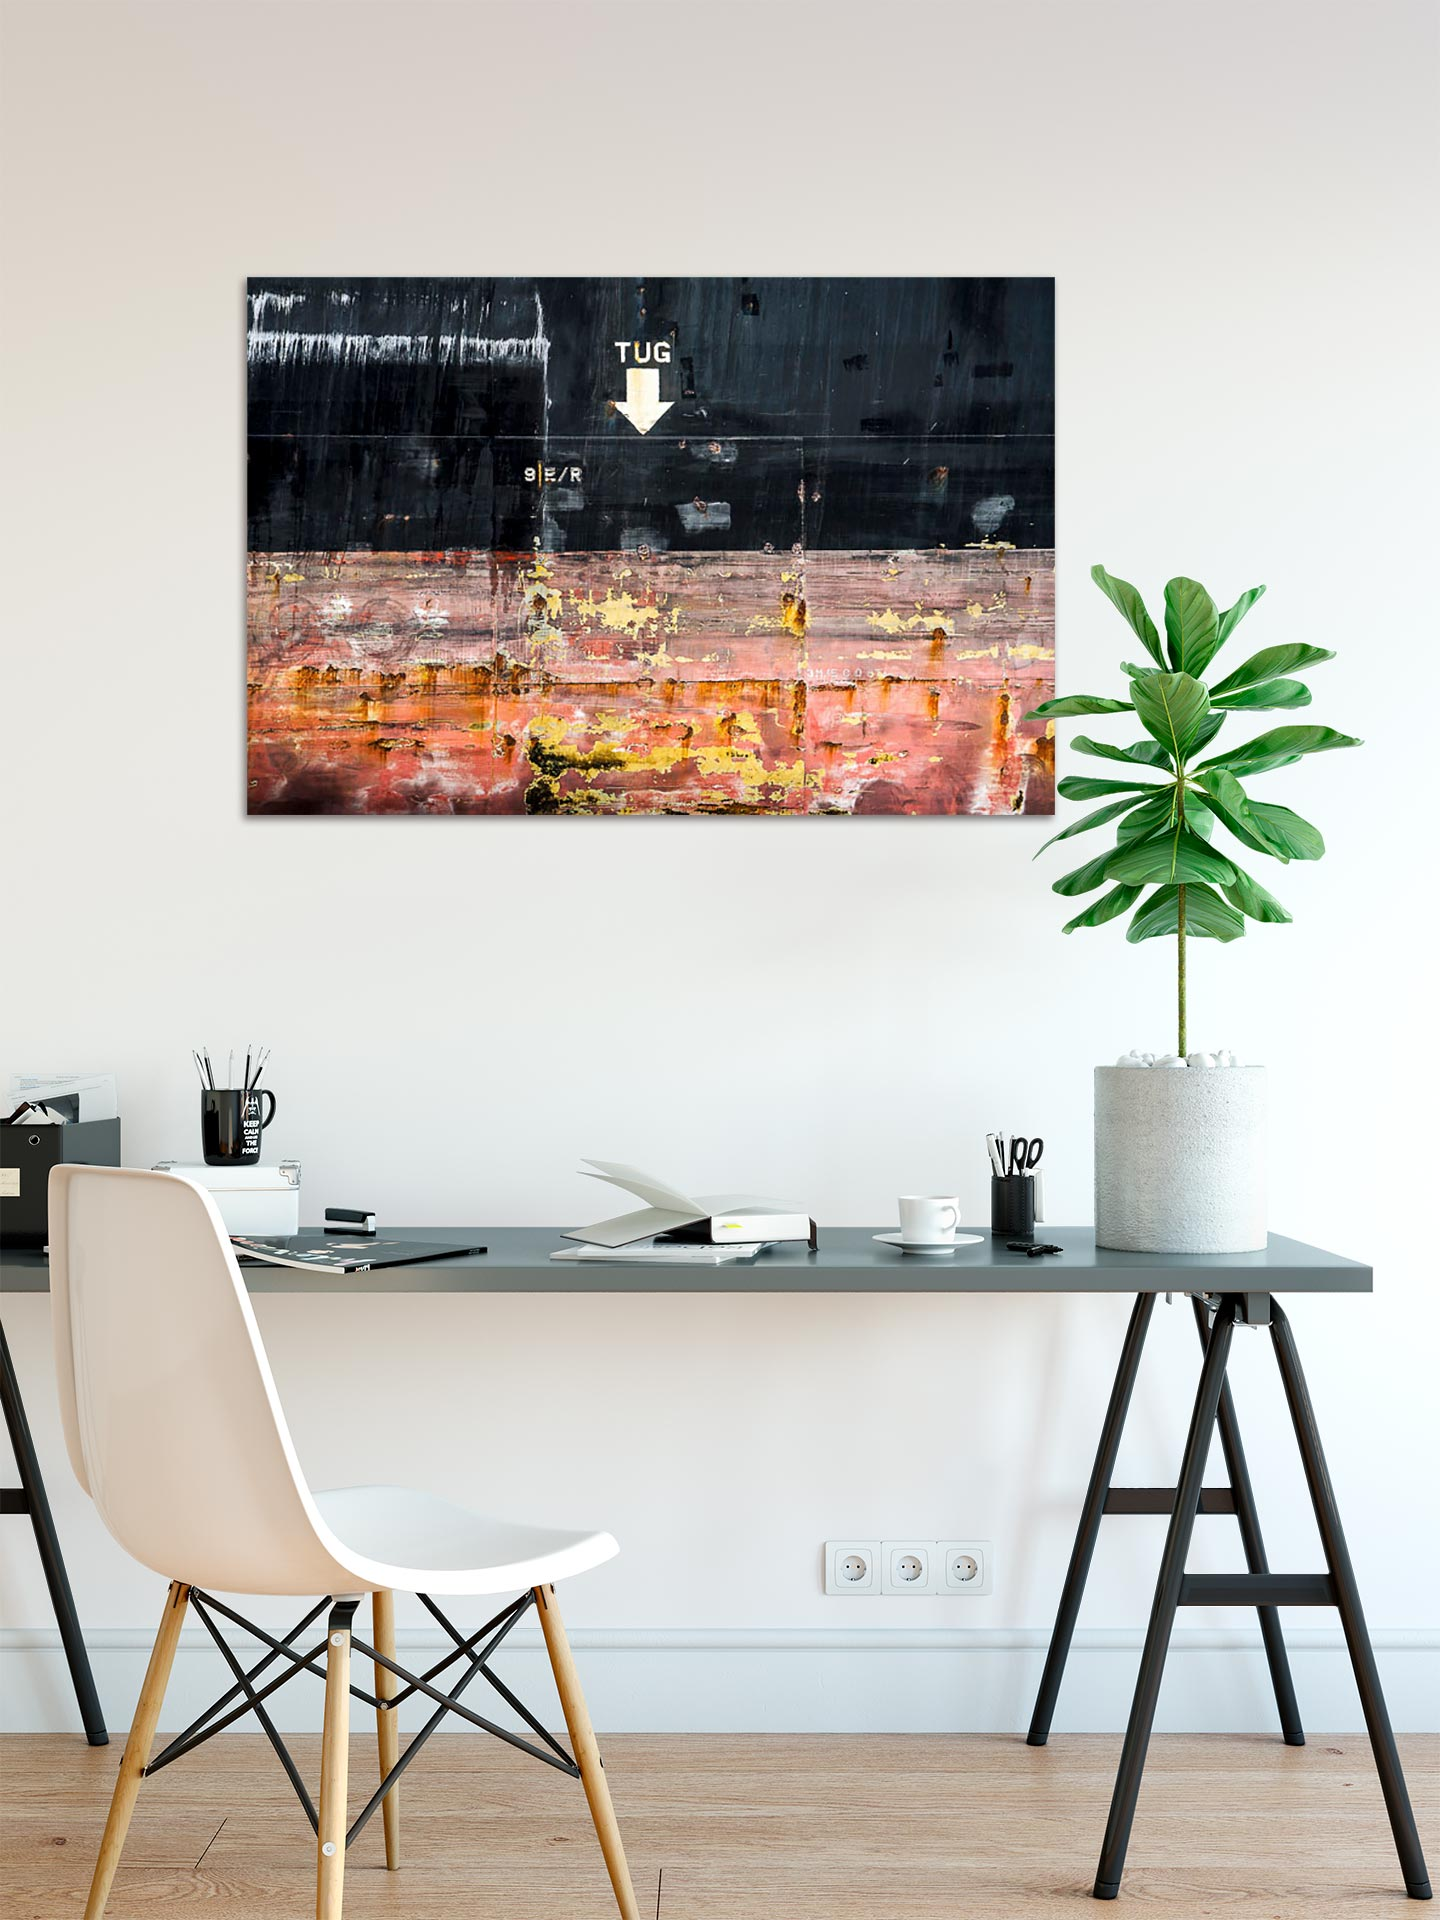 NL048-schiffswand-hamburg-wandbild-auf-leinwand-acrylglas-aludibond-arbeitszimmer